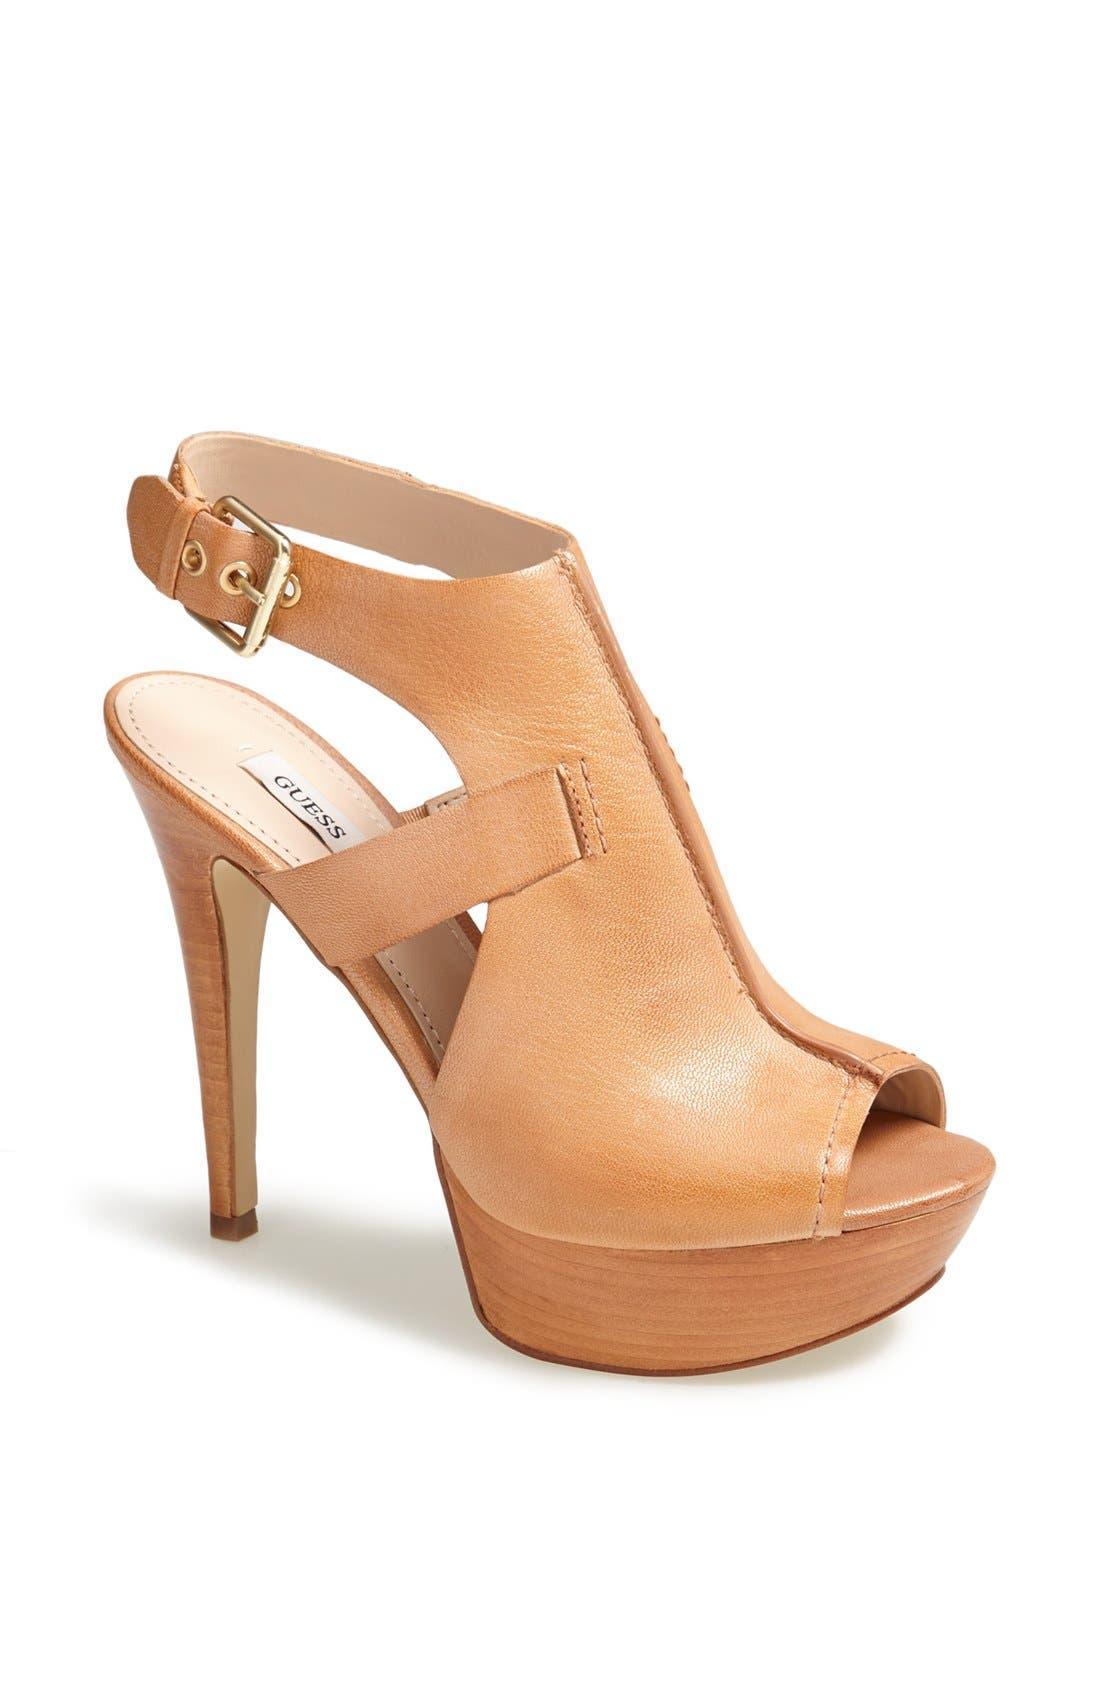 Alternate Image 1 Selected - GUESS 'Gwofira' Platform Sandal